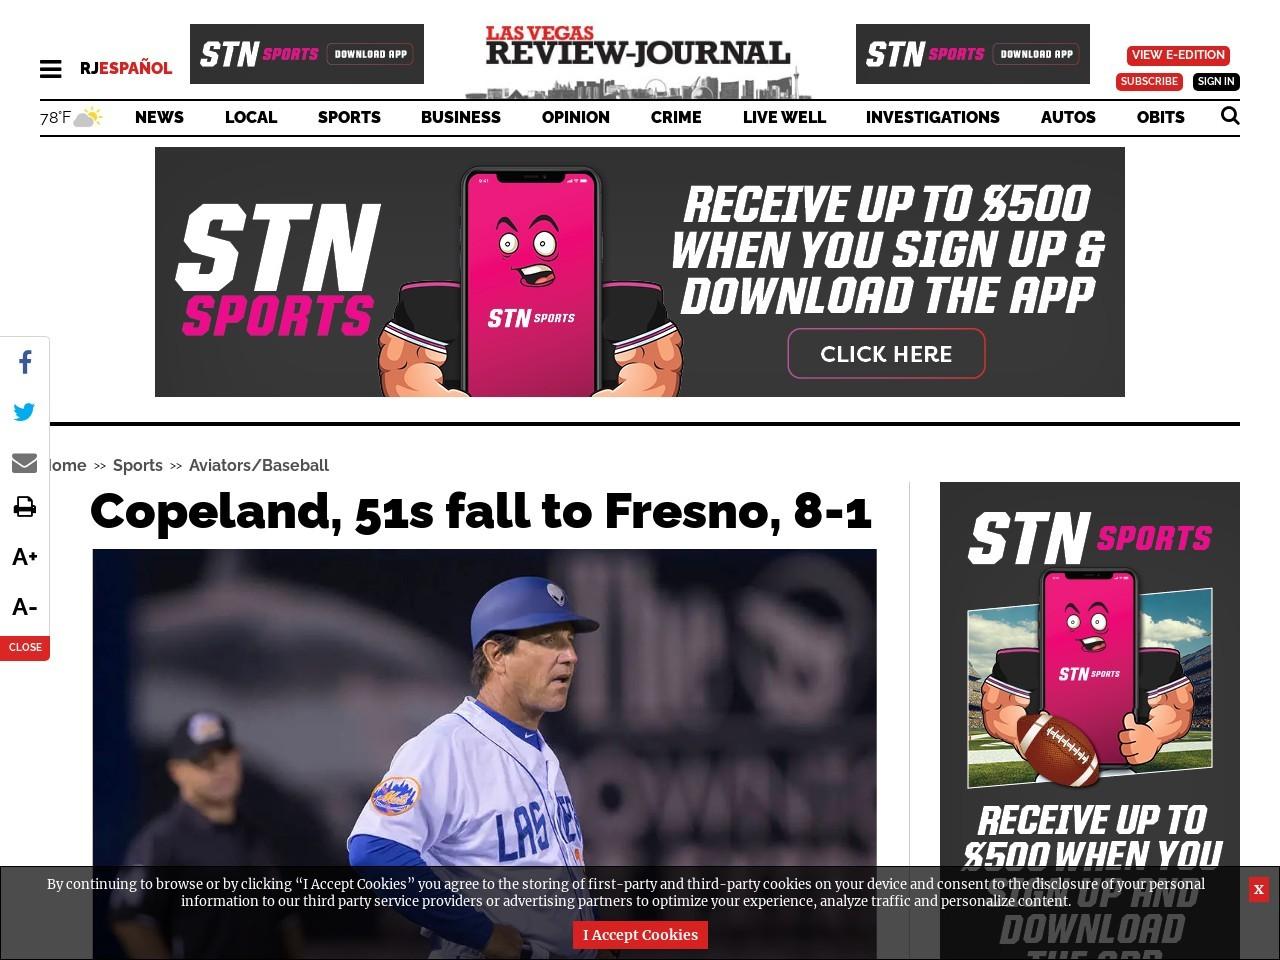 Copeland, 51s fall to Fresno, 8-1